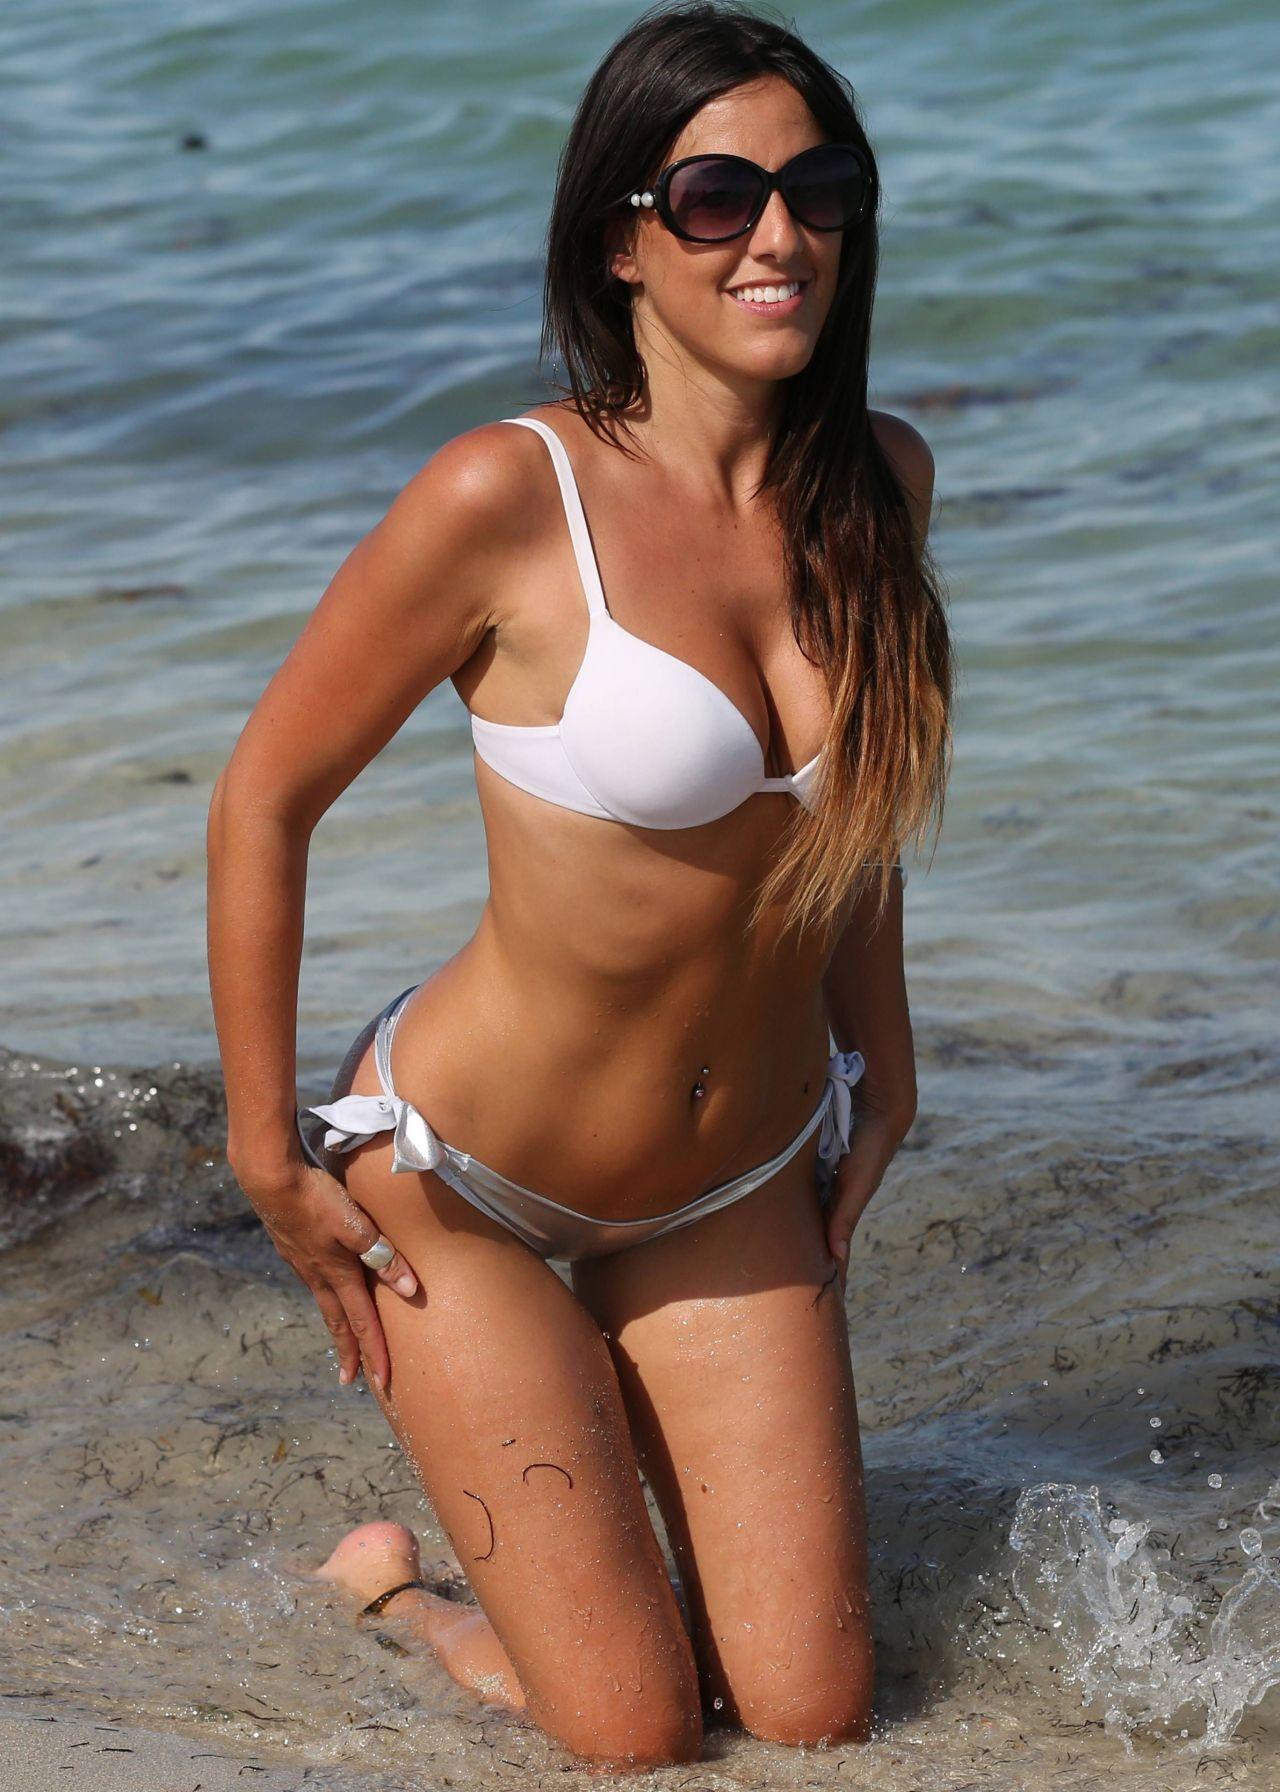 Cclaudia bikini pics — img 11